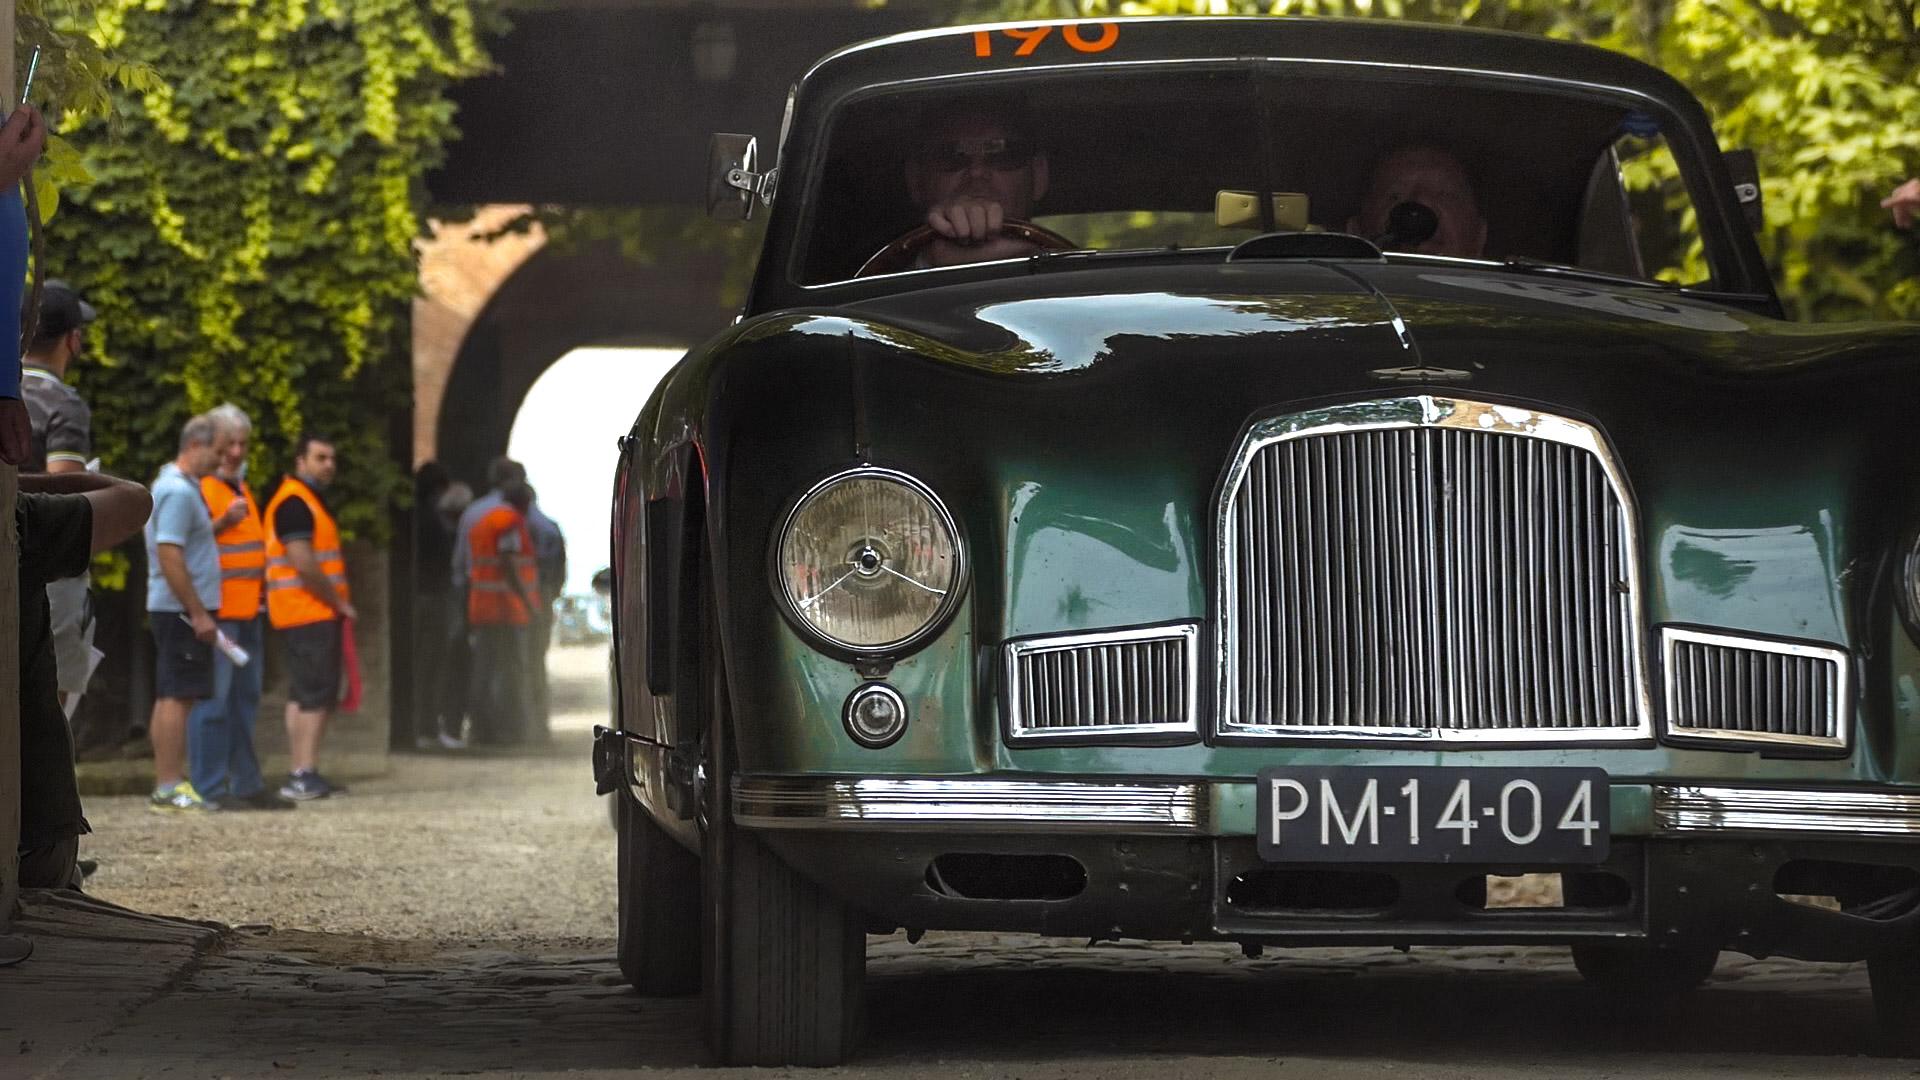 Aston Martin DB2 - PM-14-04 (NL)